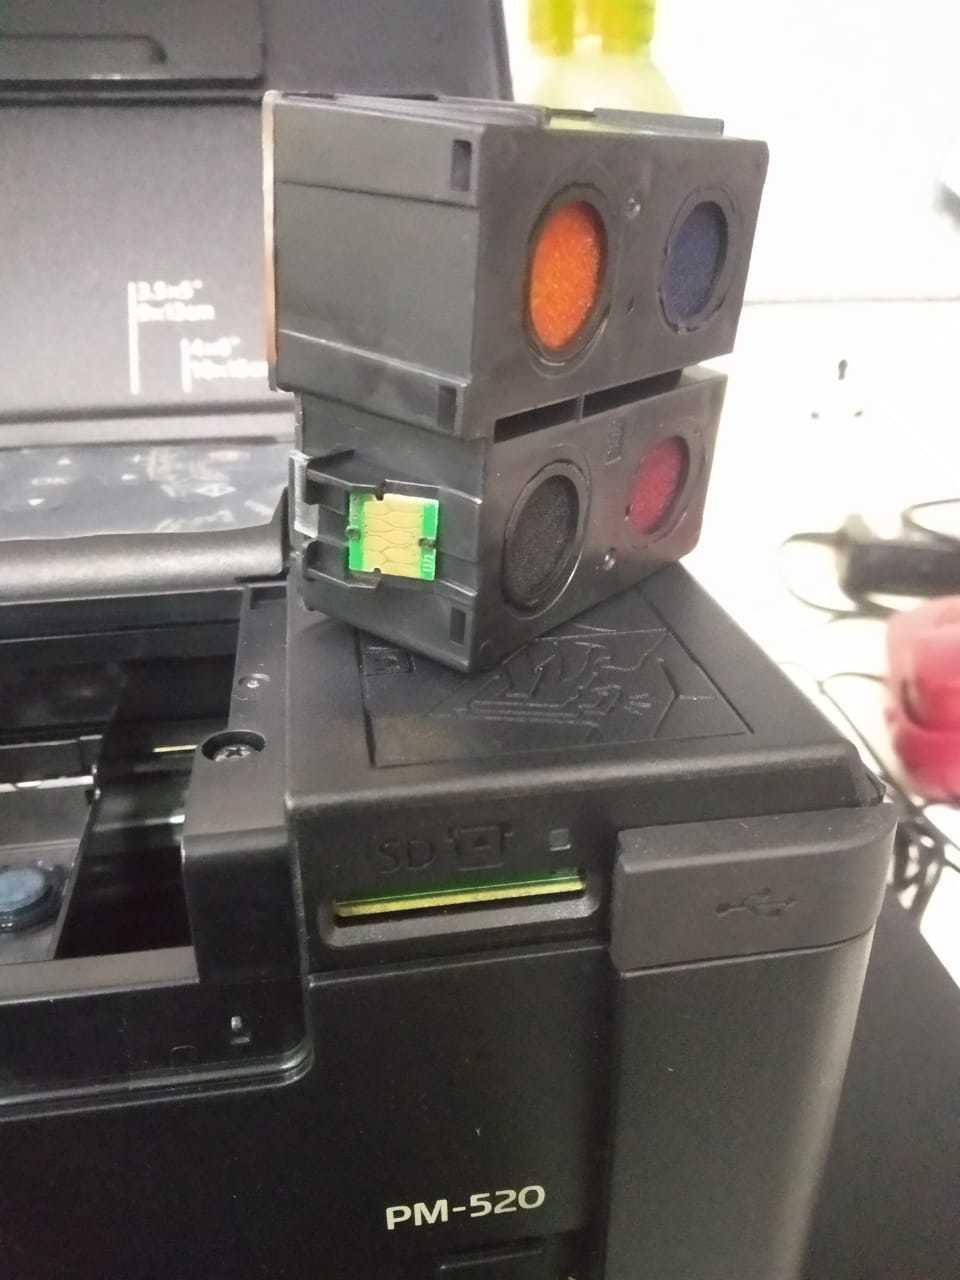 Formujet Epson PM 520 - T372 Cartridge